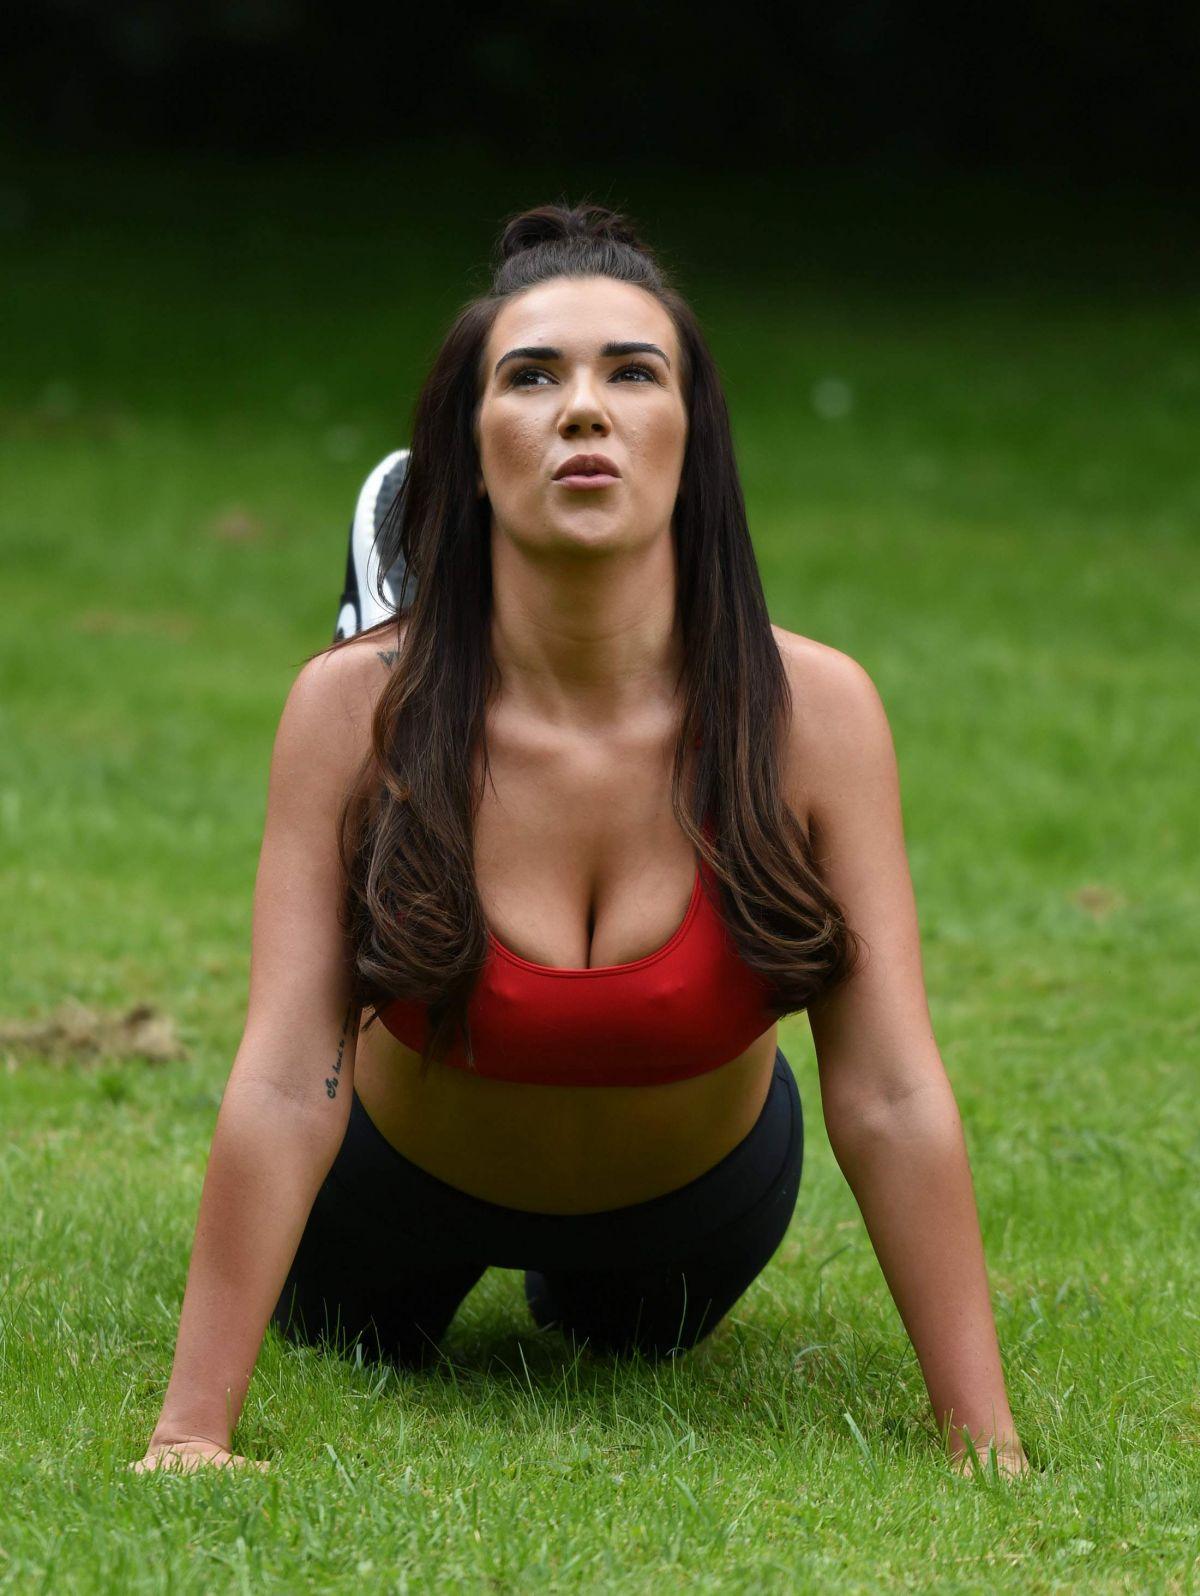 Paparazzi Imogen Townley nudes (18 photo), Sexy, Bikini, Feet, swimsuit 2015